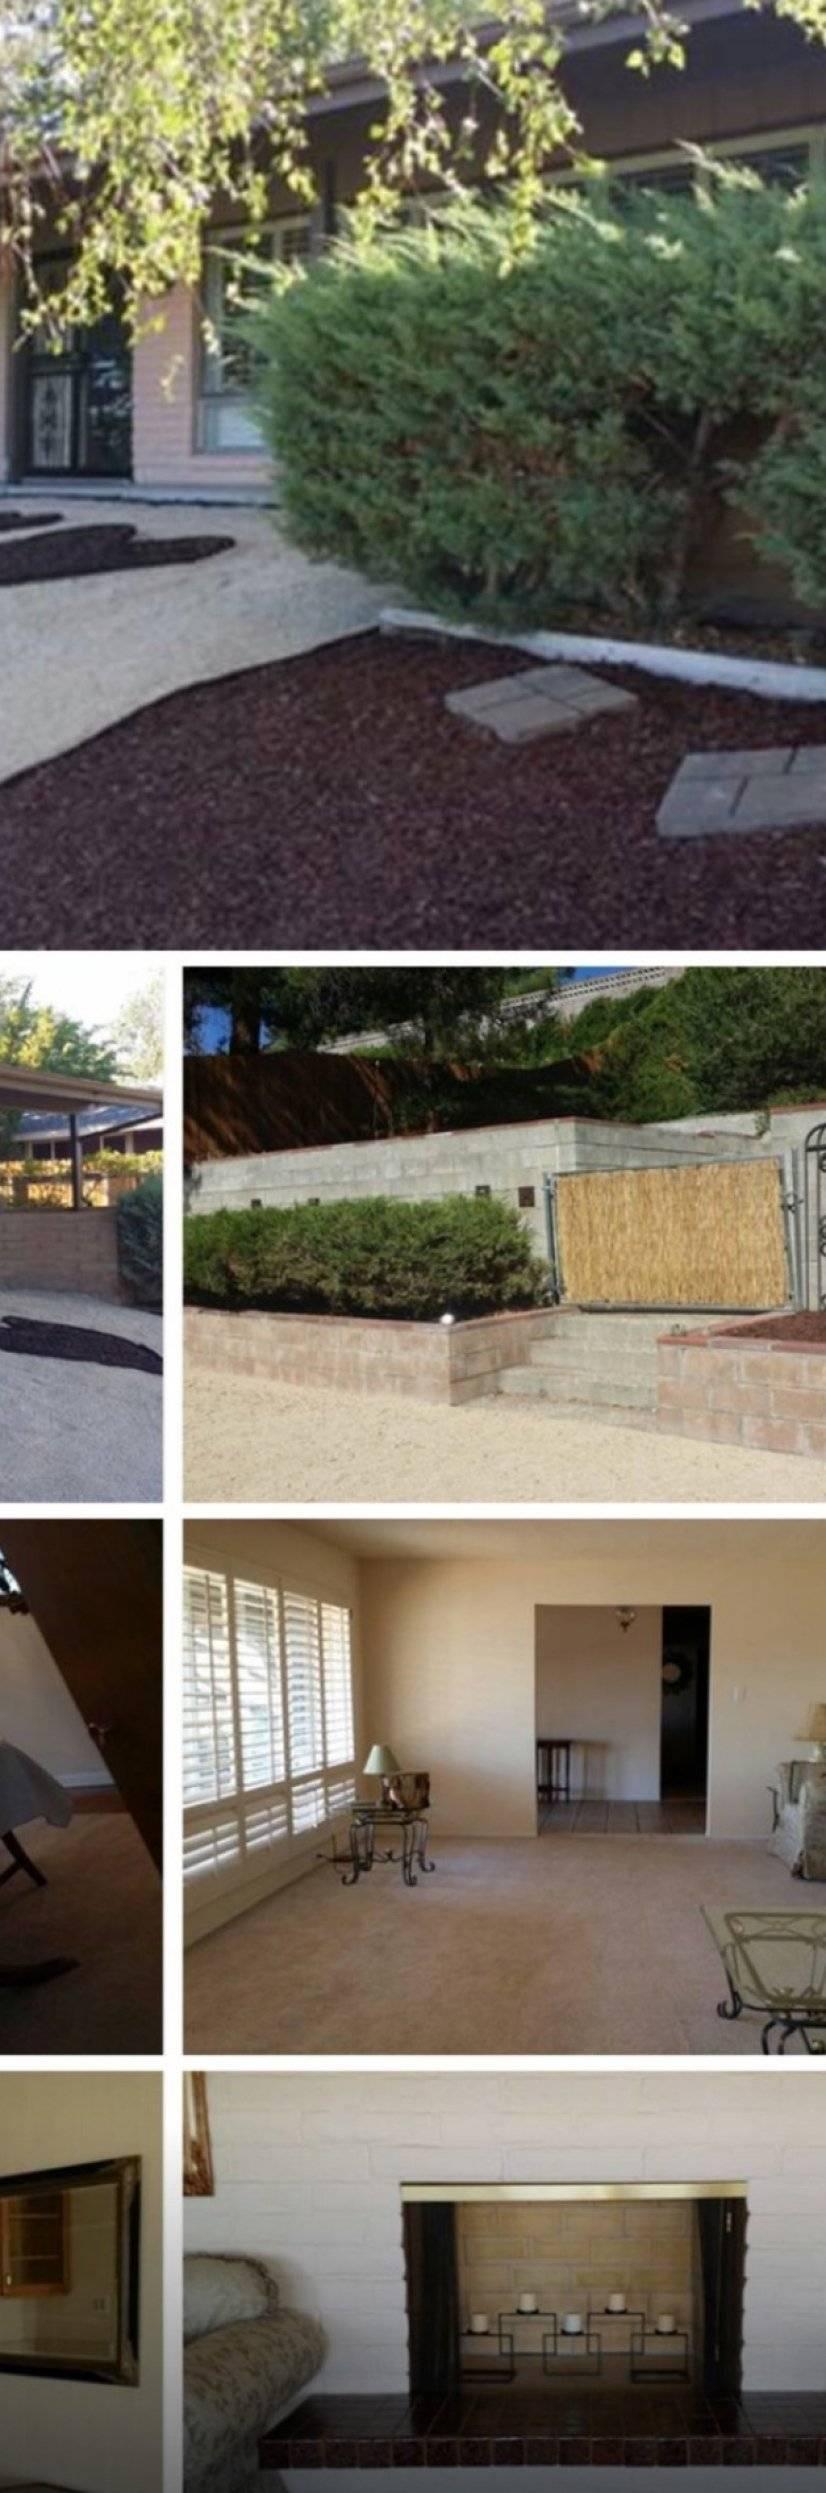 image 5 Furnished room to rent in Washoe (Reno), Reno-Tahoe Territory 2 bedroom House